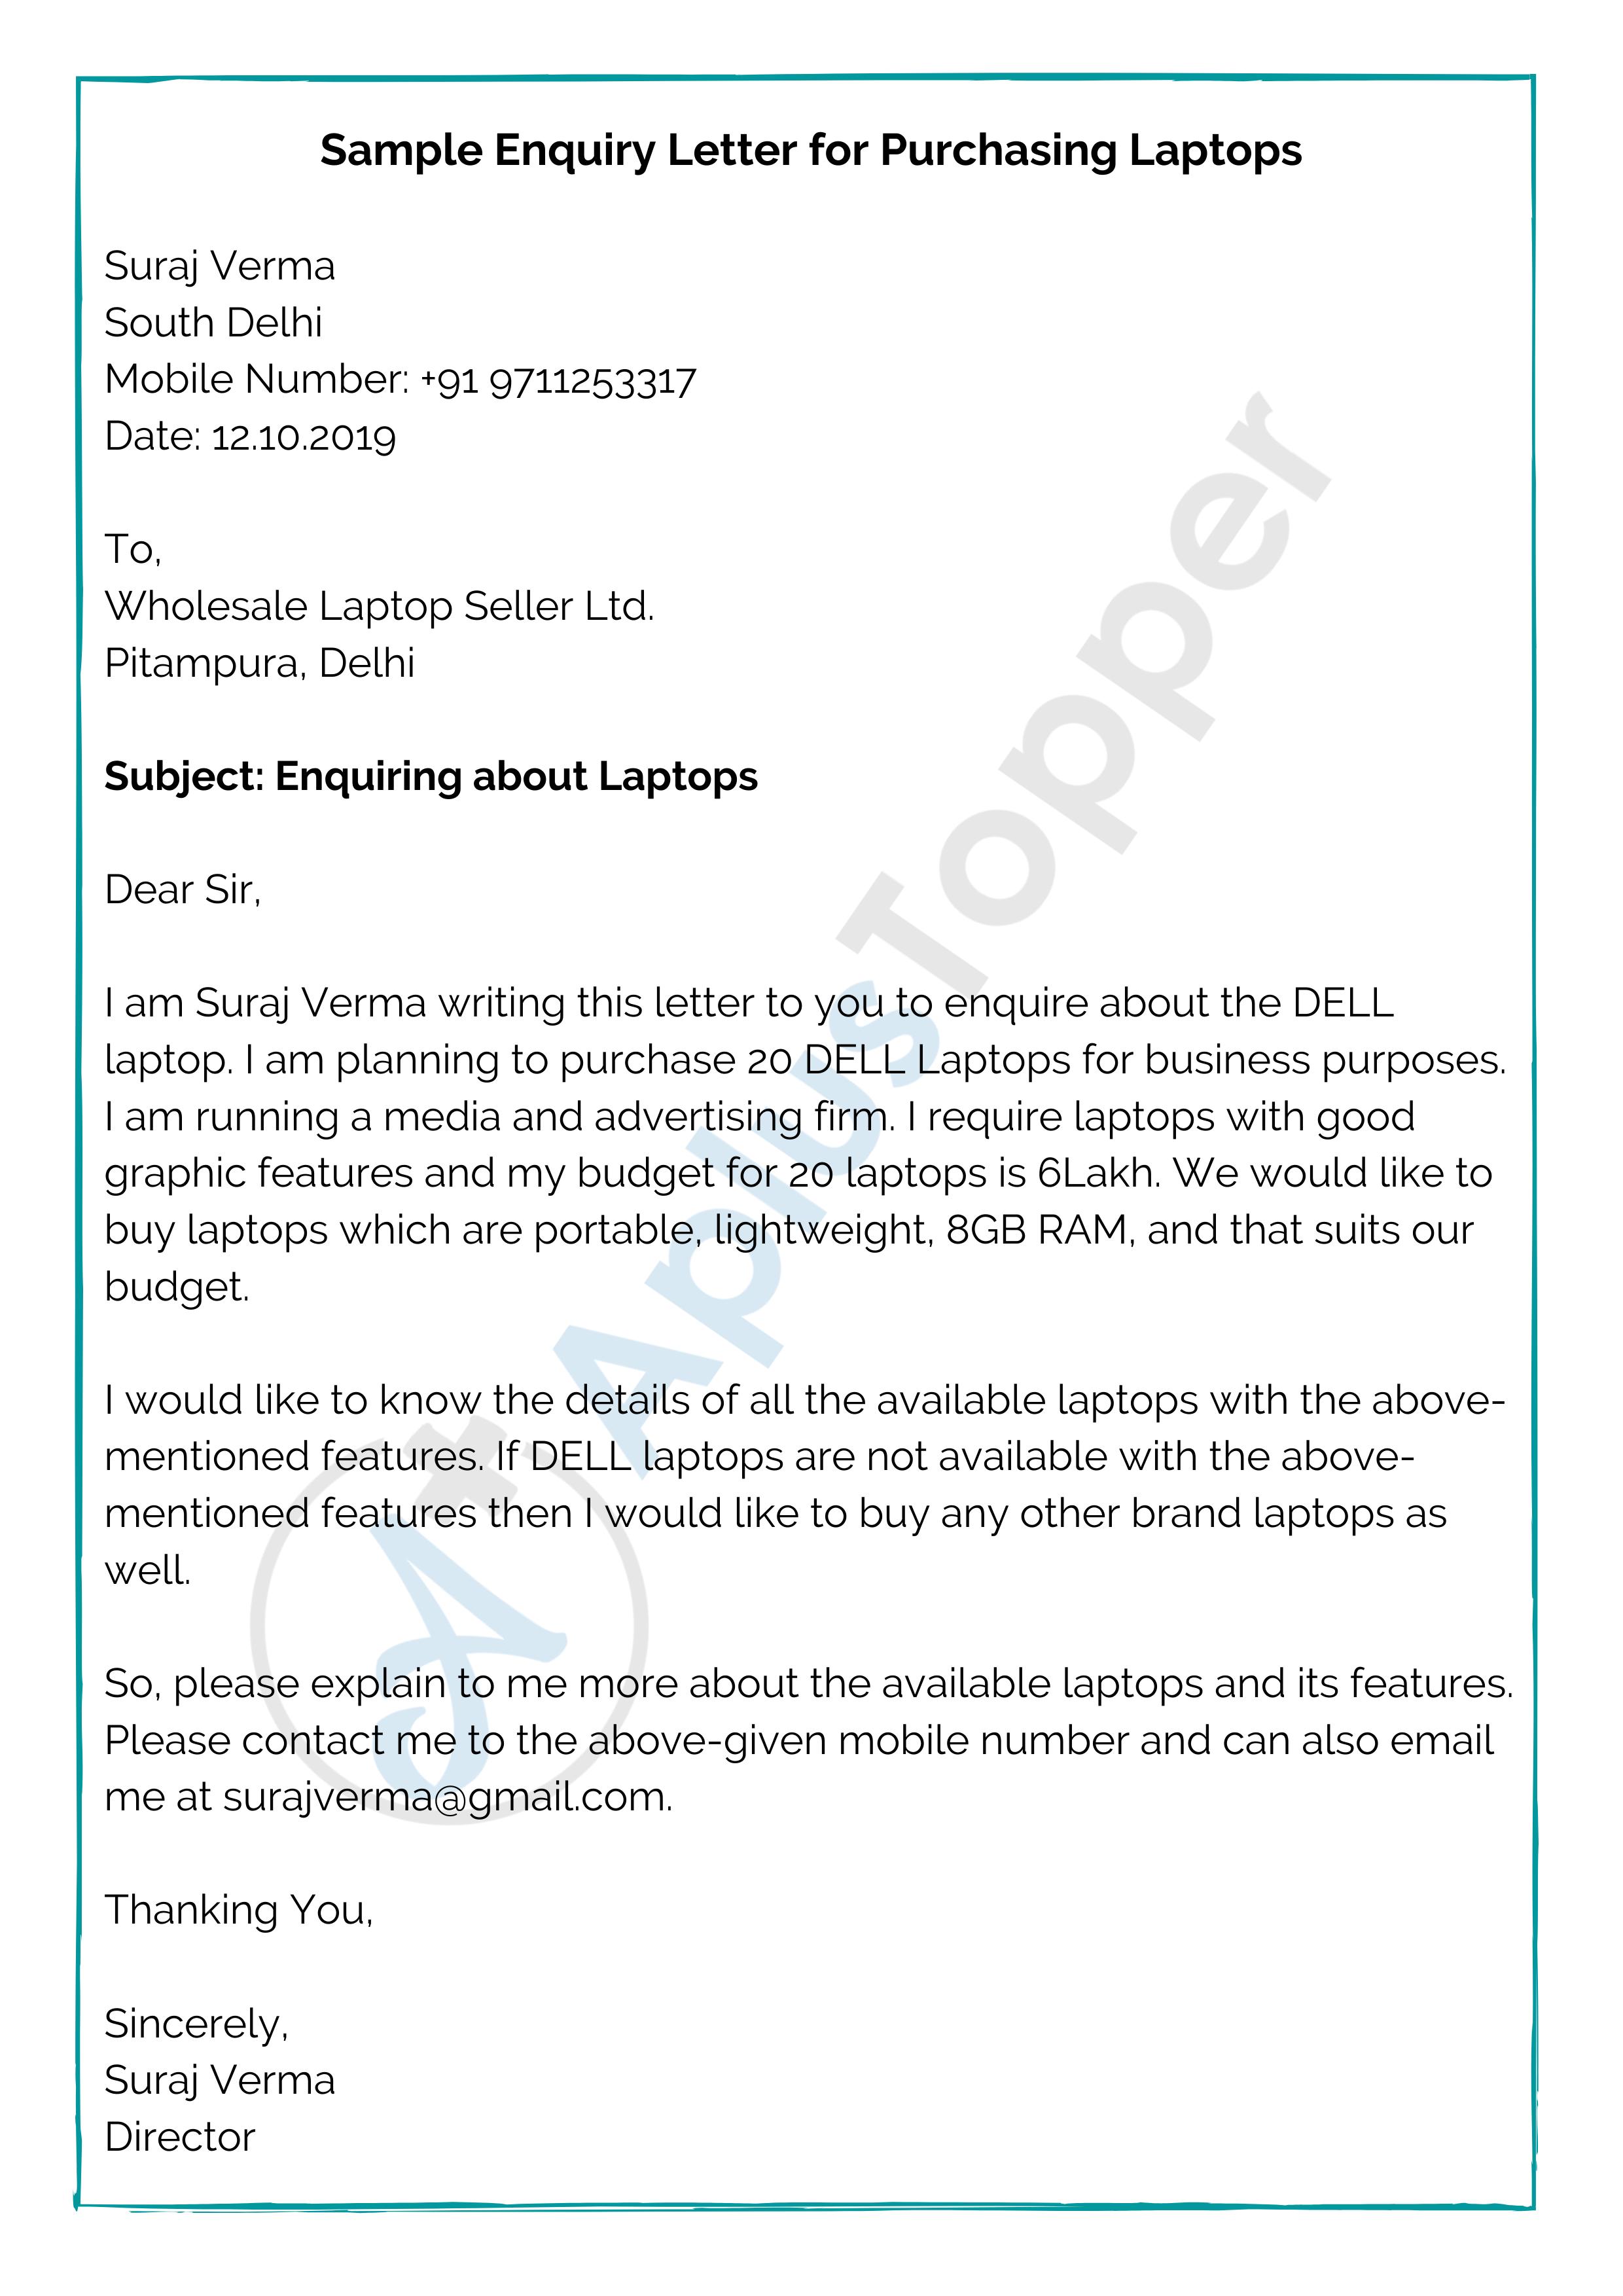 Sample Enquiry Letter for Purchasing Laptops